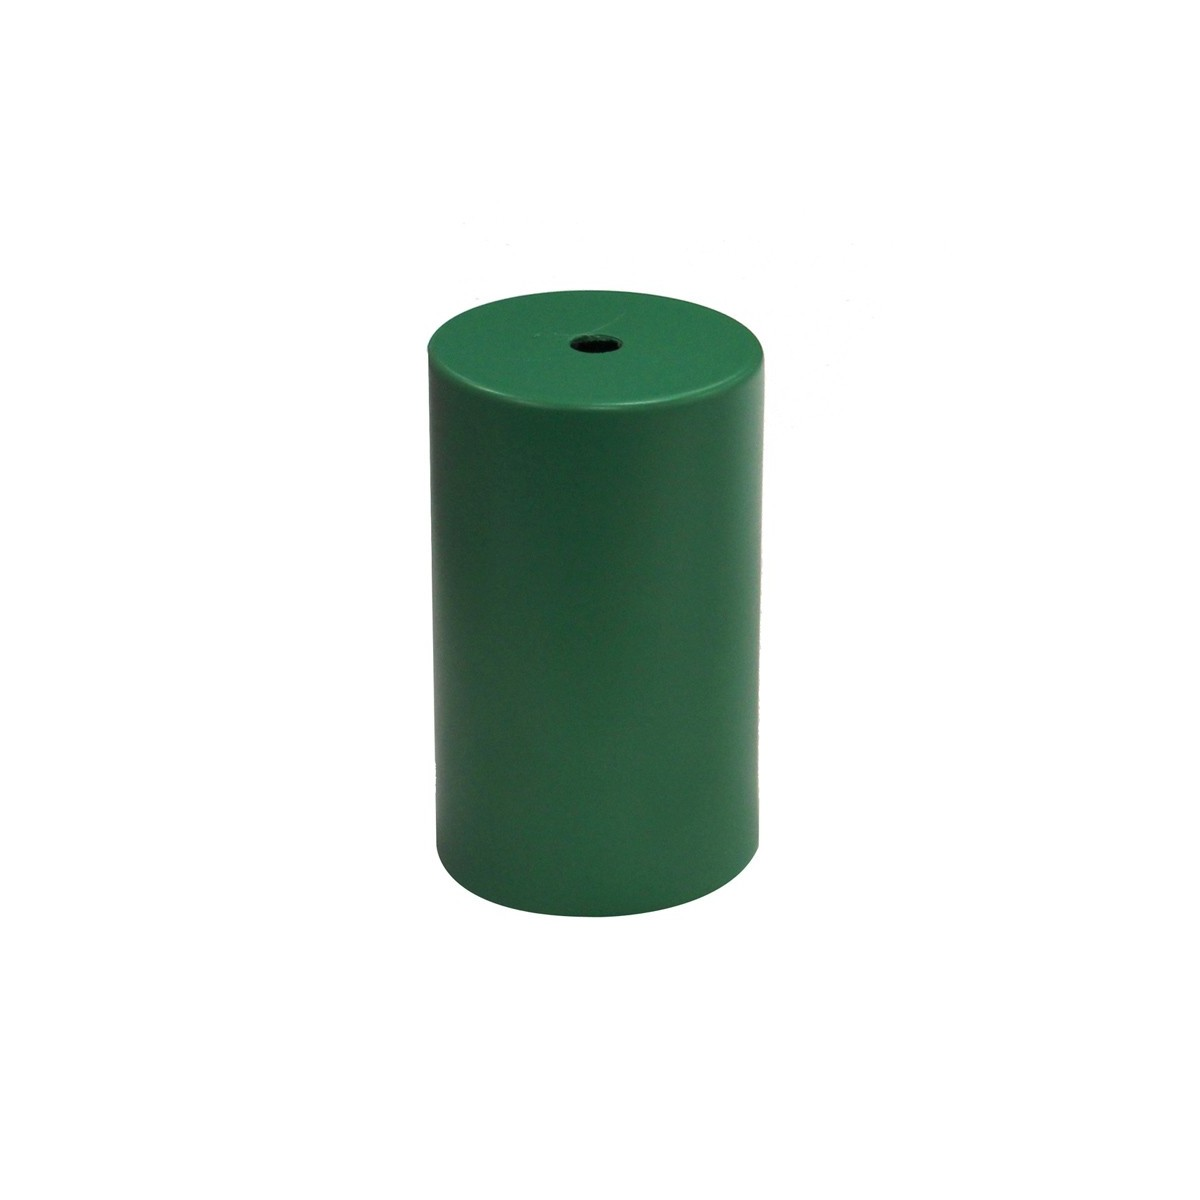 Cubre construct verde Make it